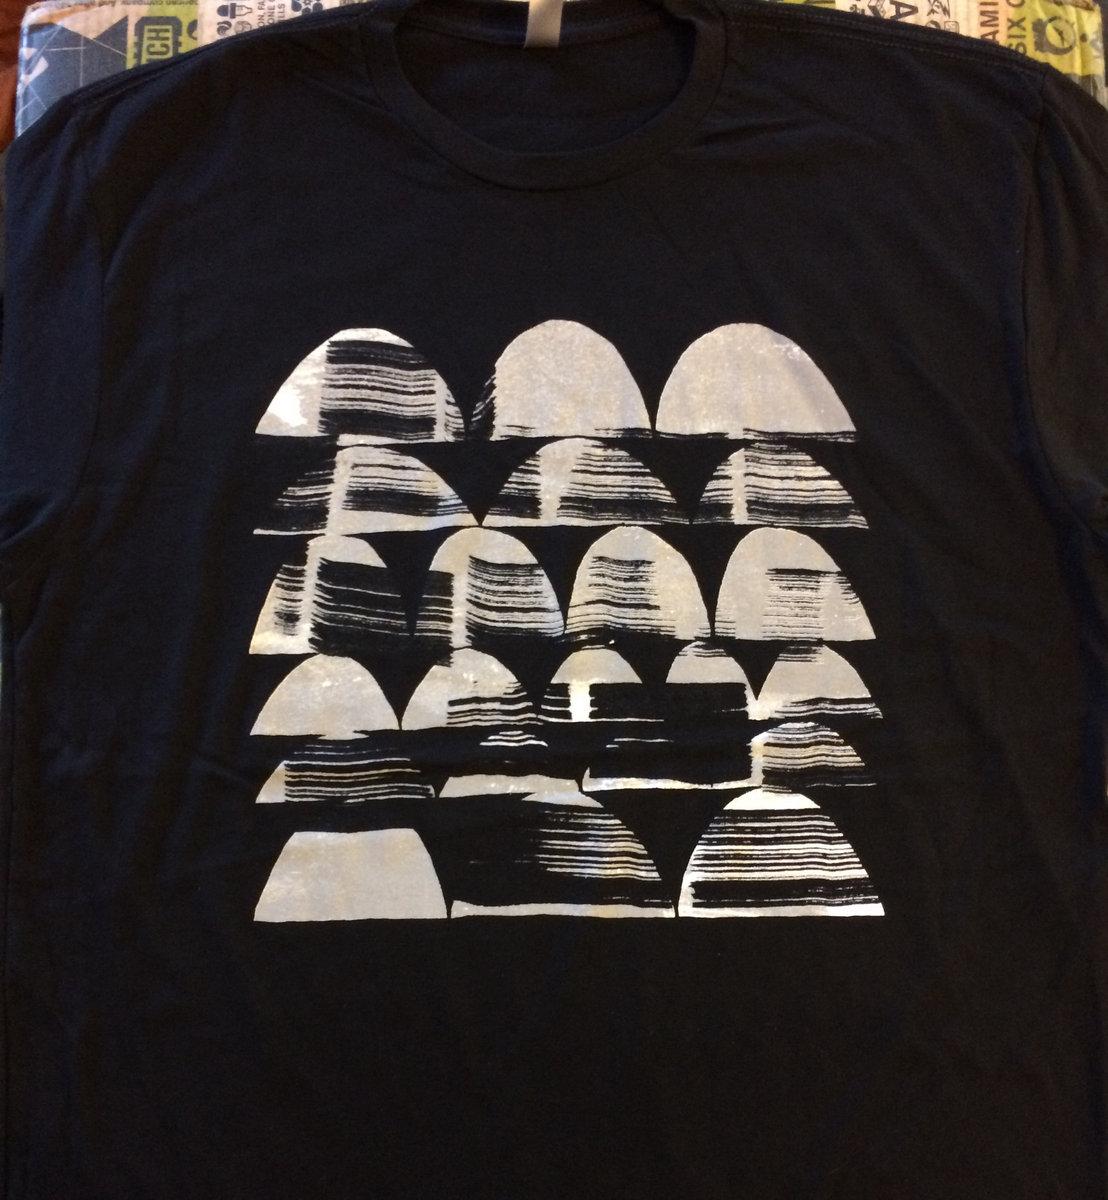 Treasure Pains Alternate Cover T Shirt Slow Mass